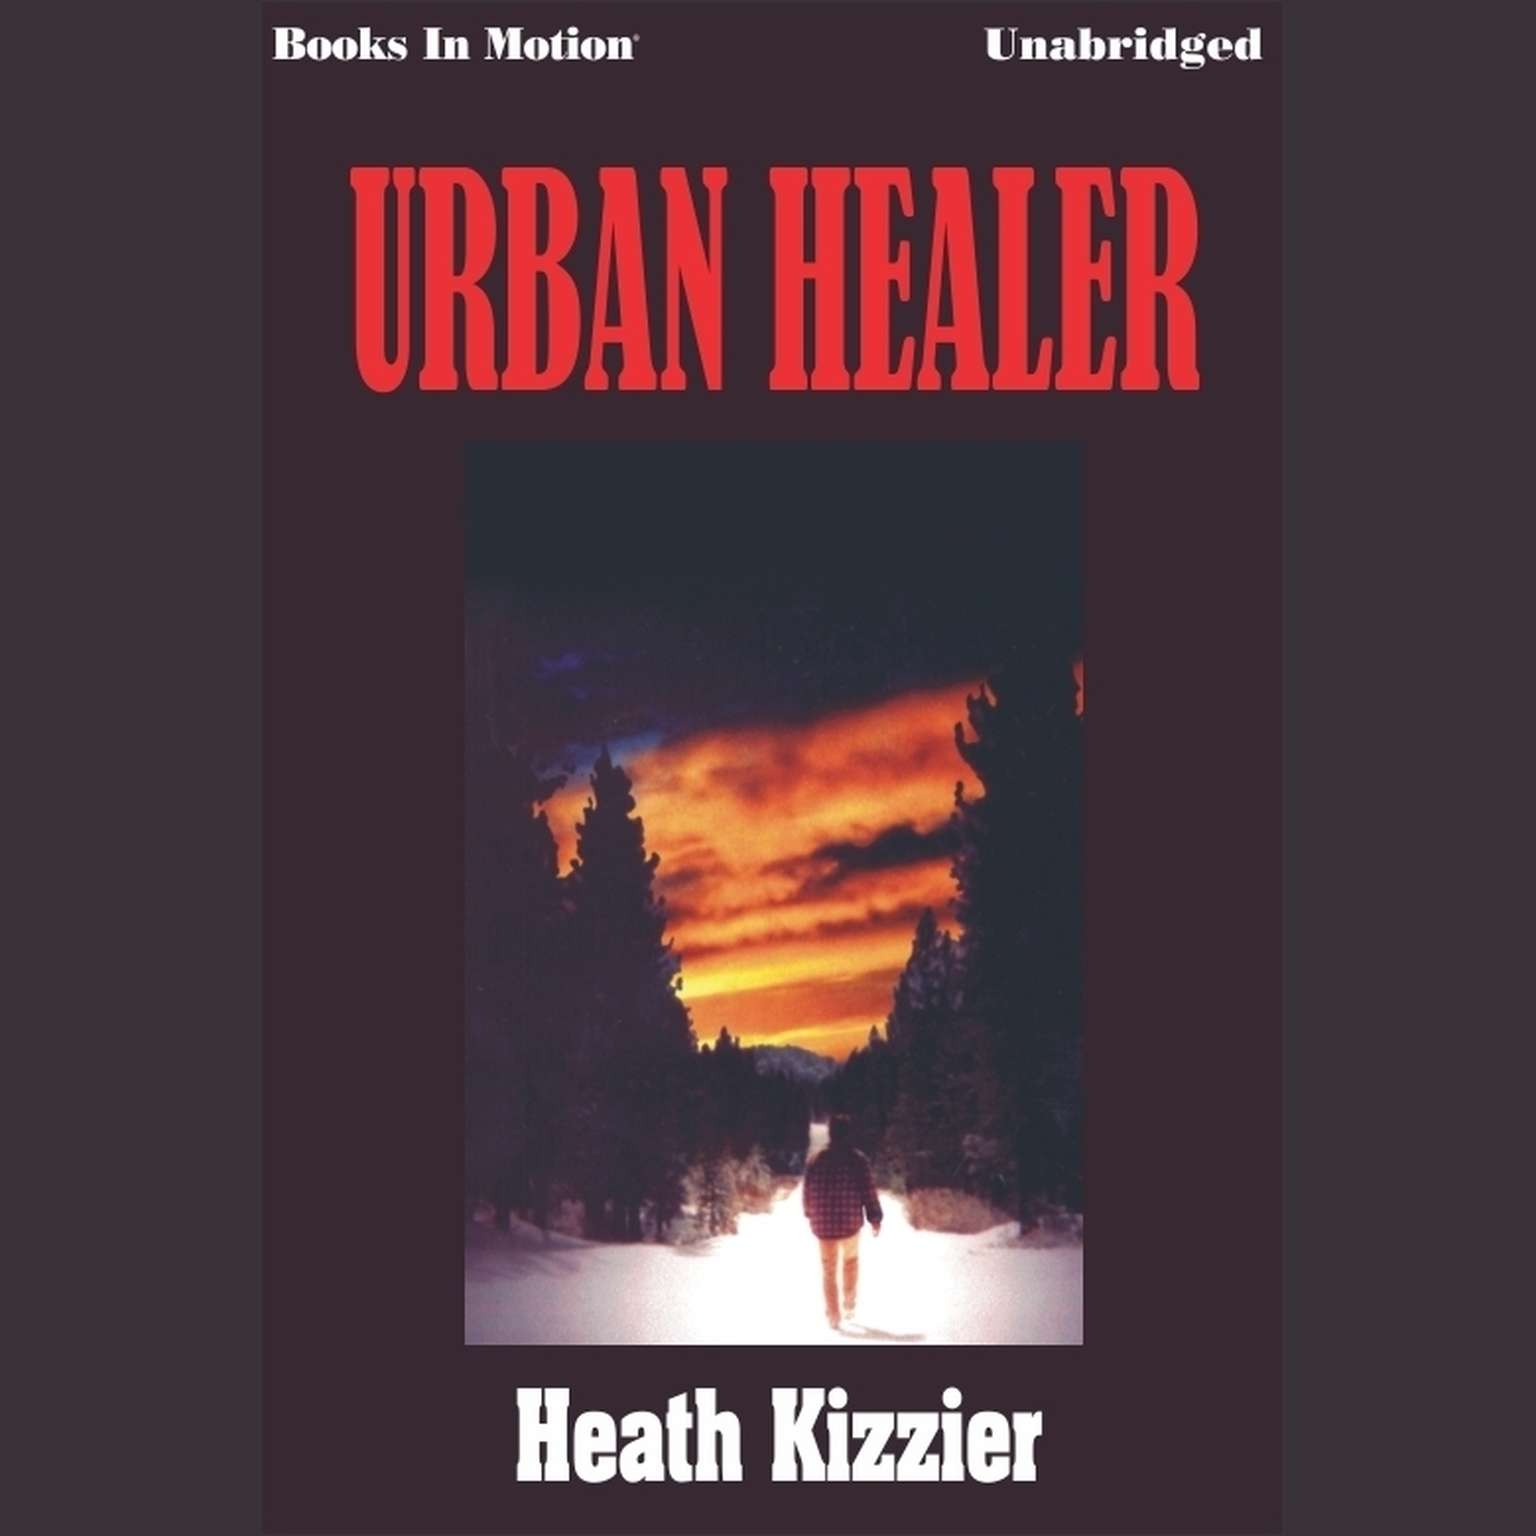 Urban Healer Audiobook, by Heath Kizzier